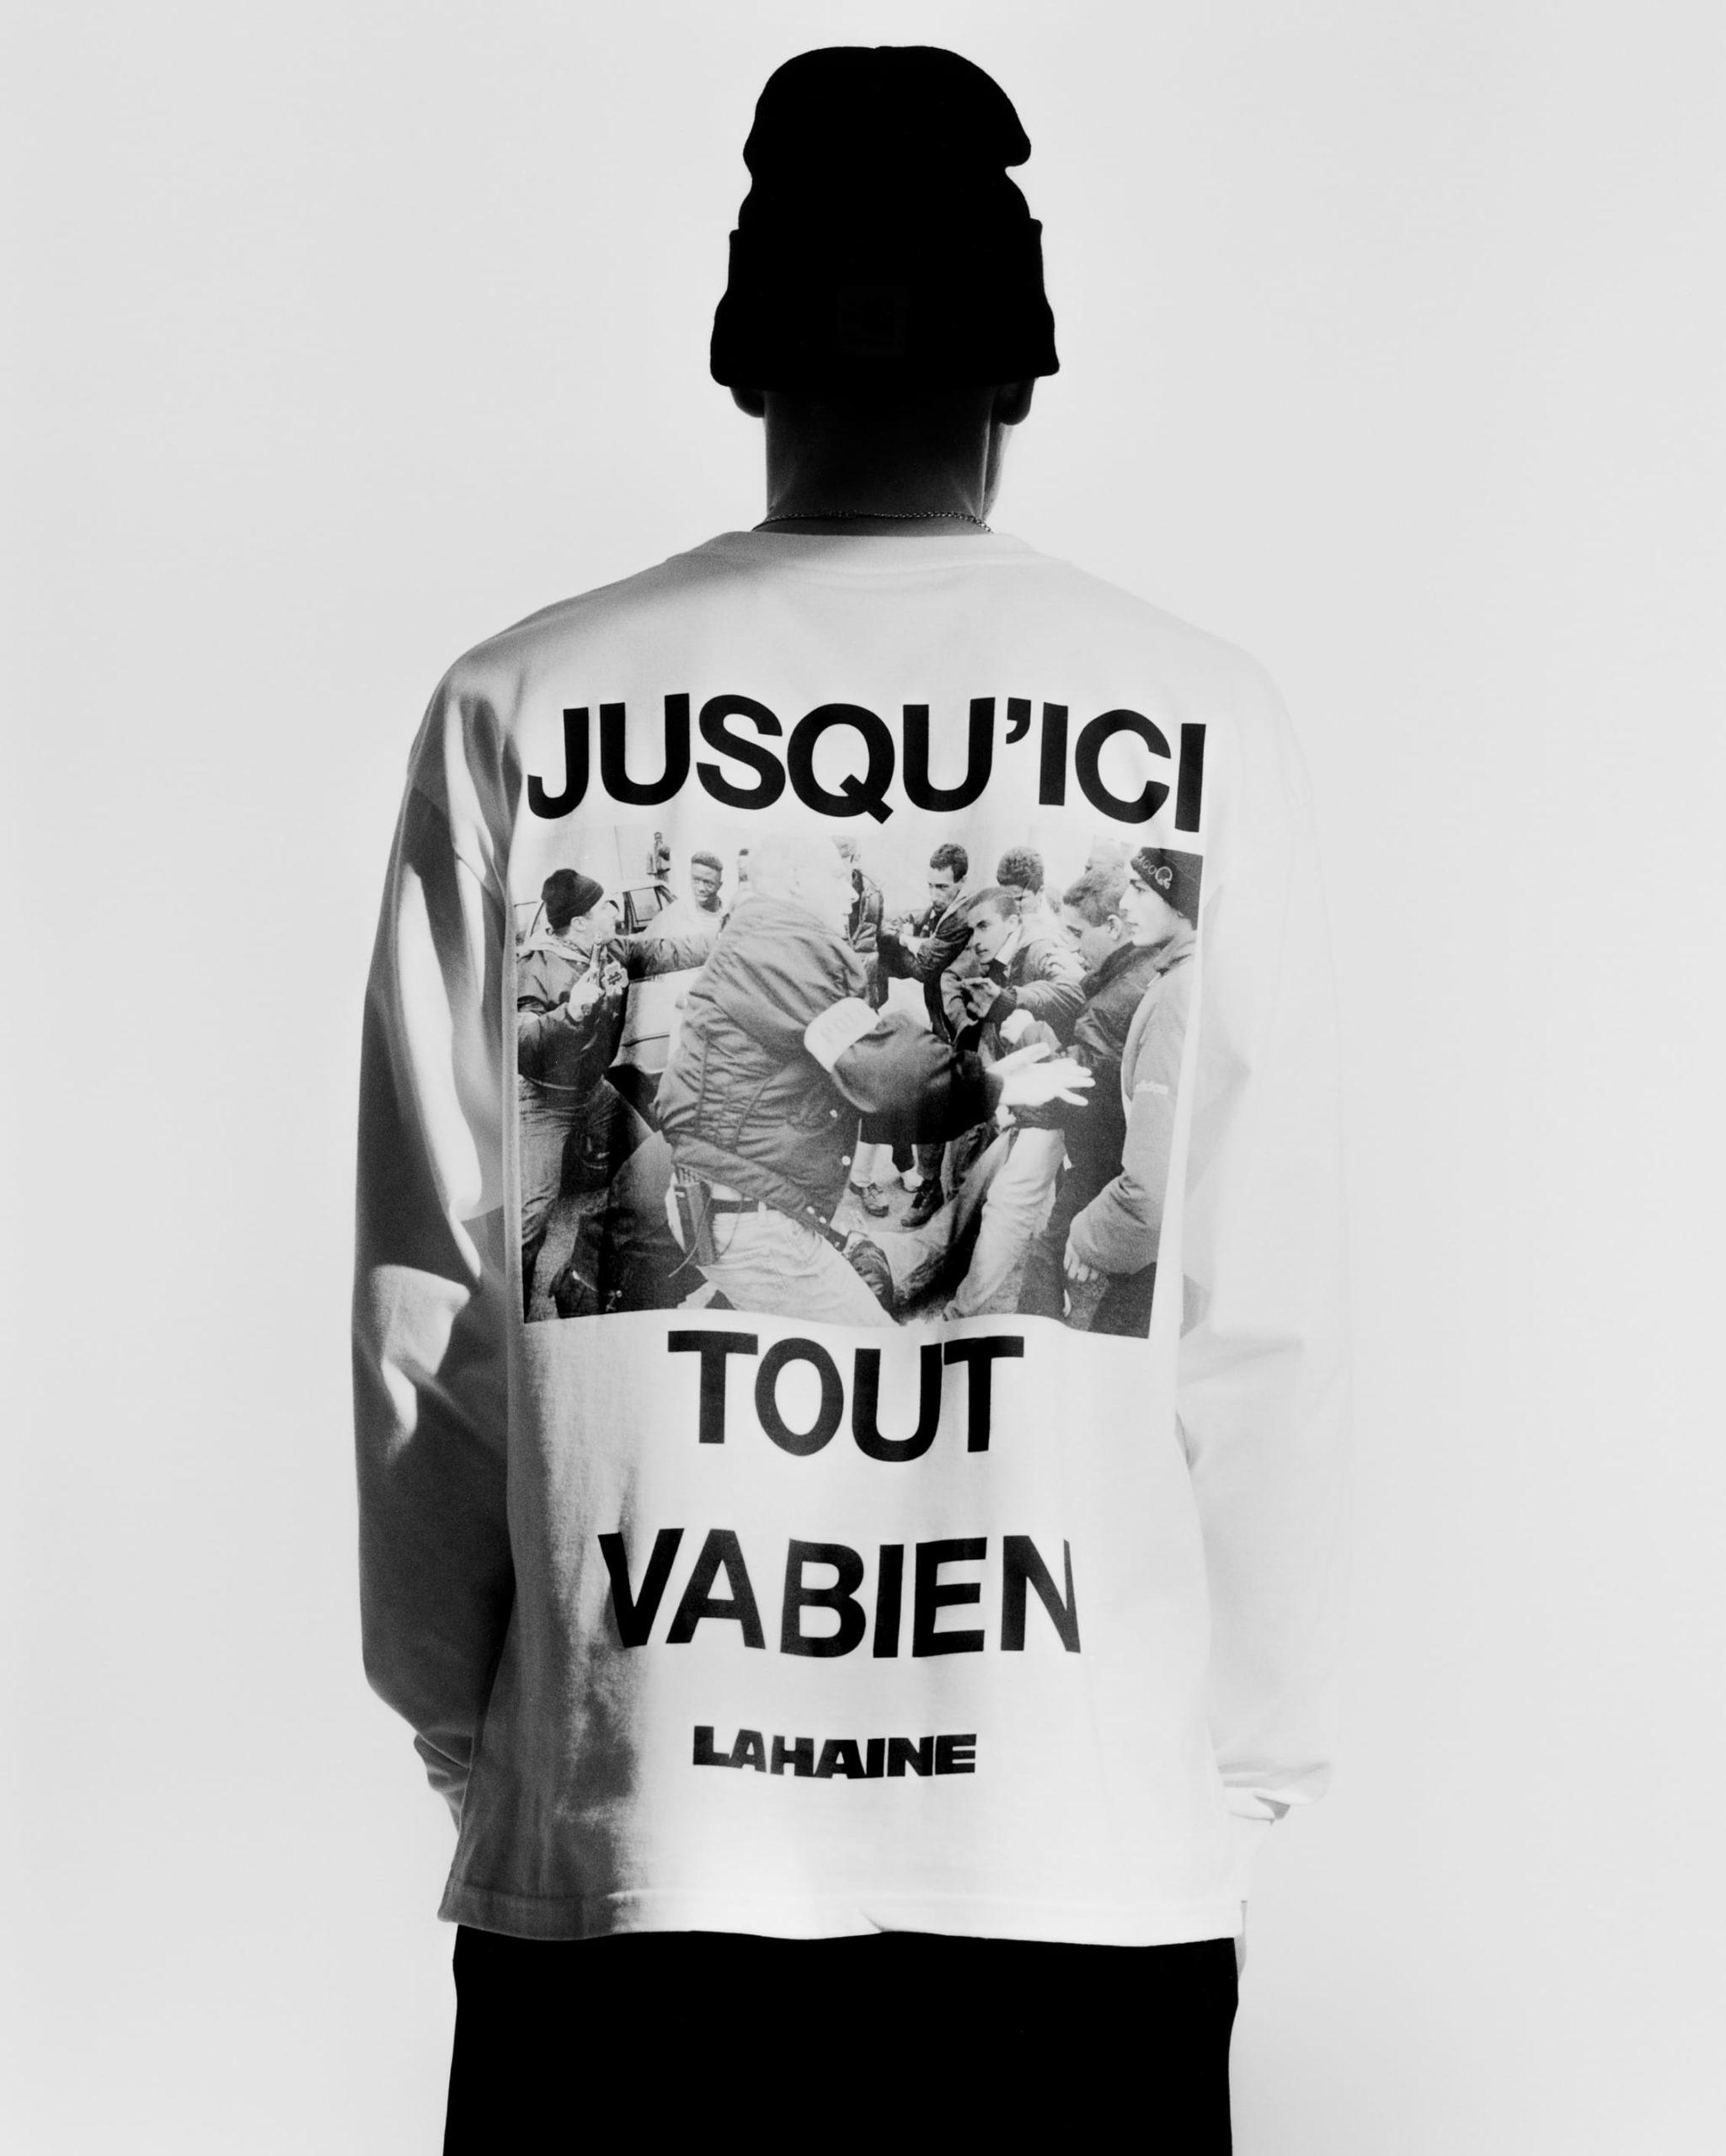 Collection La Haine x Carhartt WIP